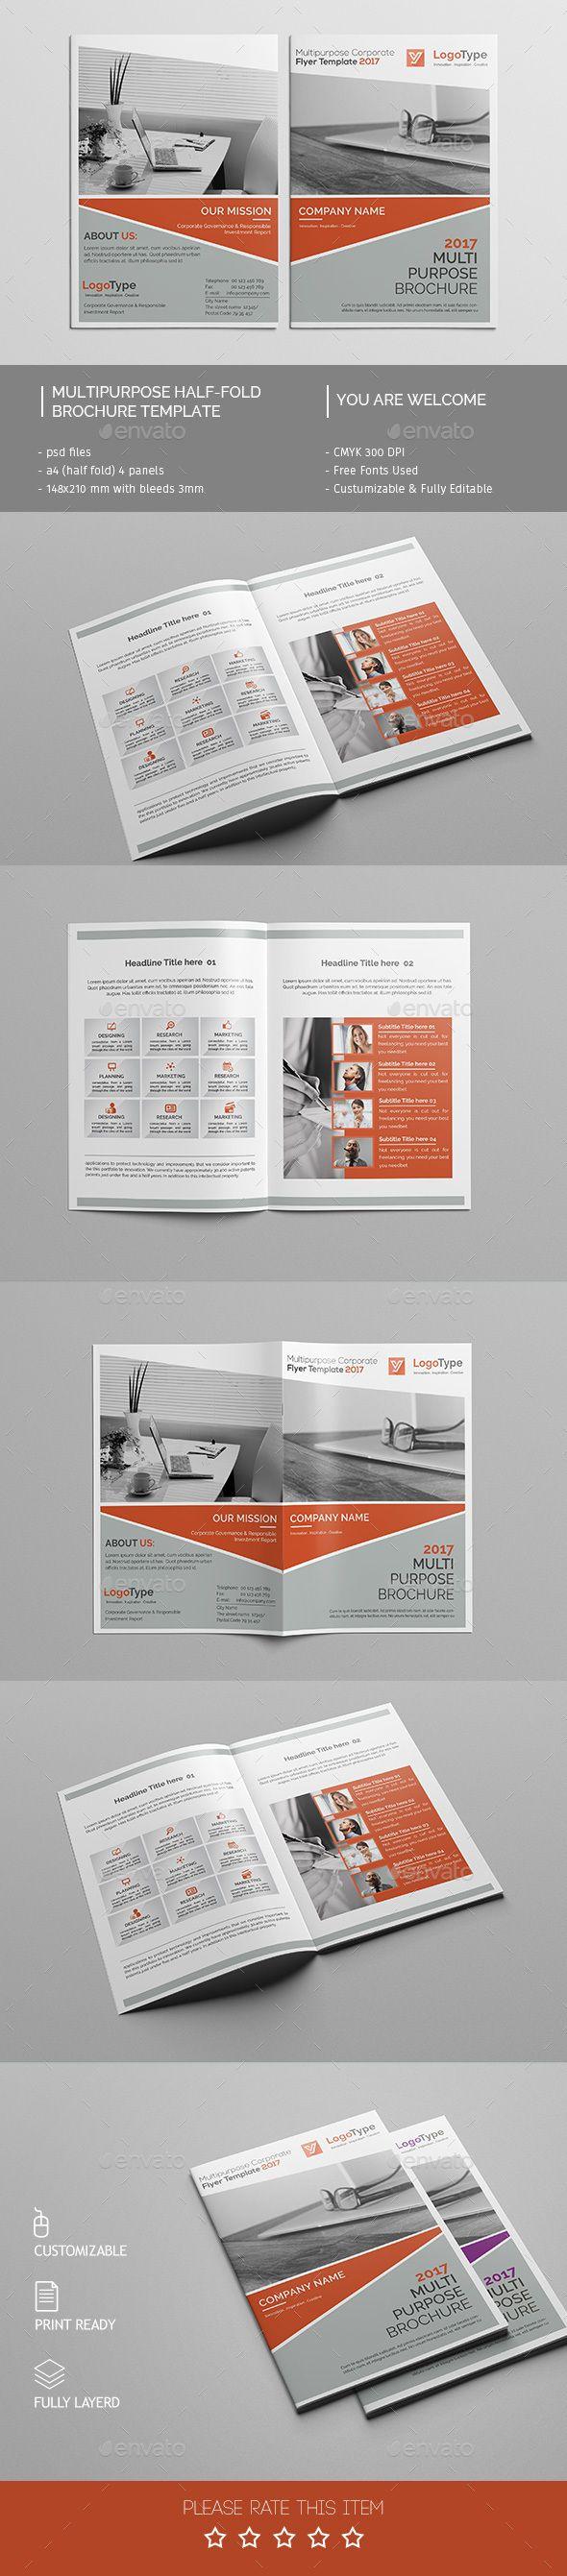 Corporate Bi-fold Brochure Template PSD #design Download: http://graphicriver.net/item/corporate-bifold-brochure-template-03/14311432?ref=ksioks